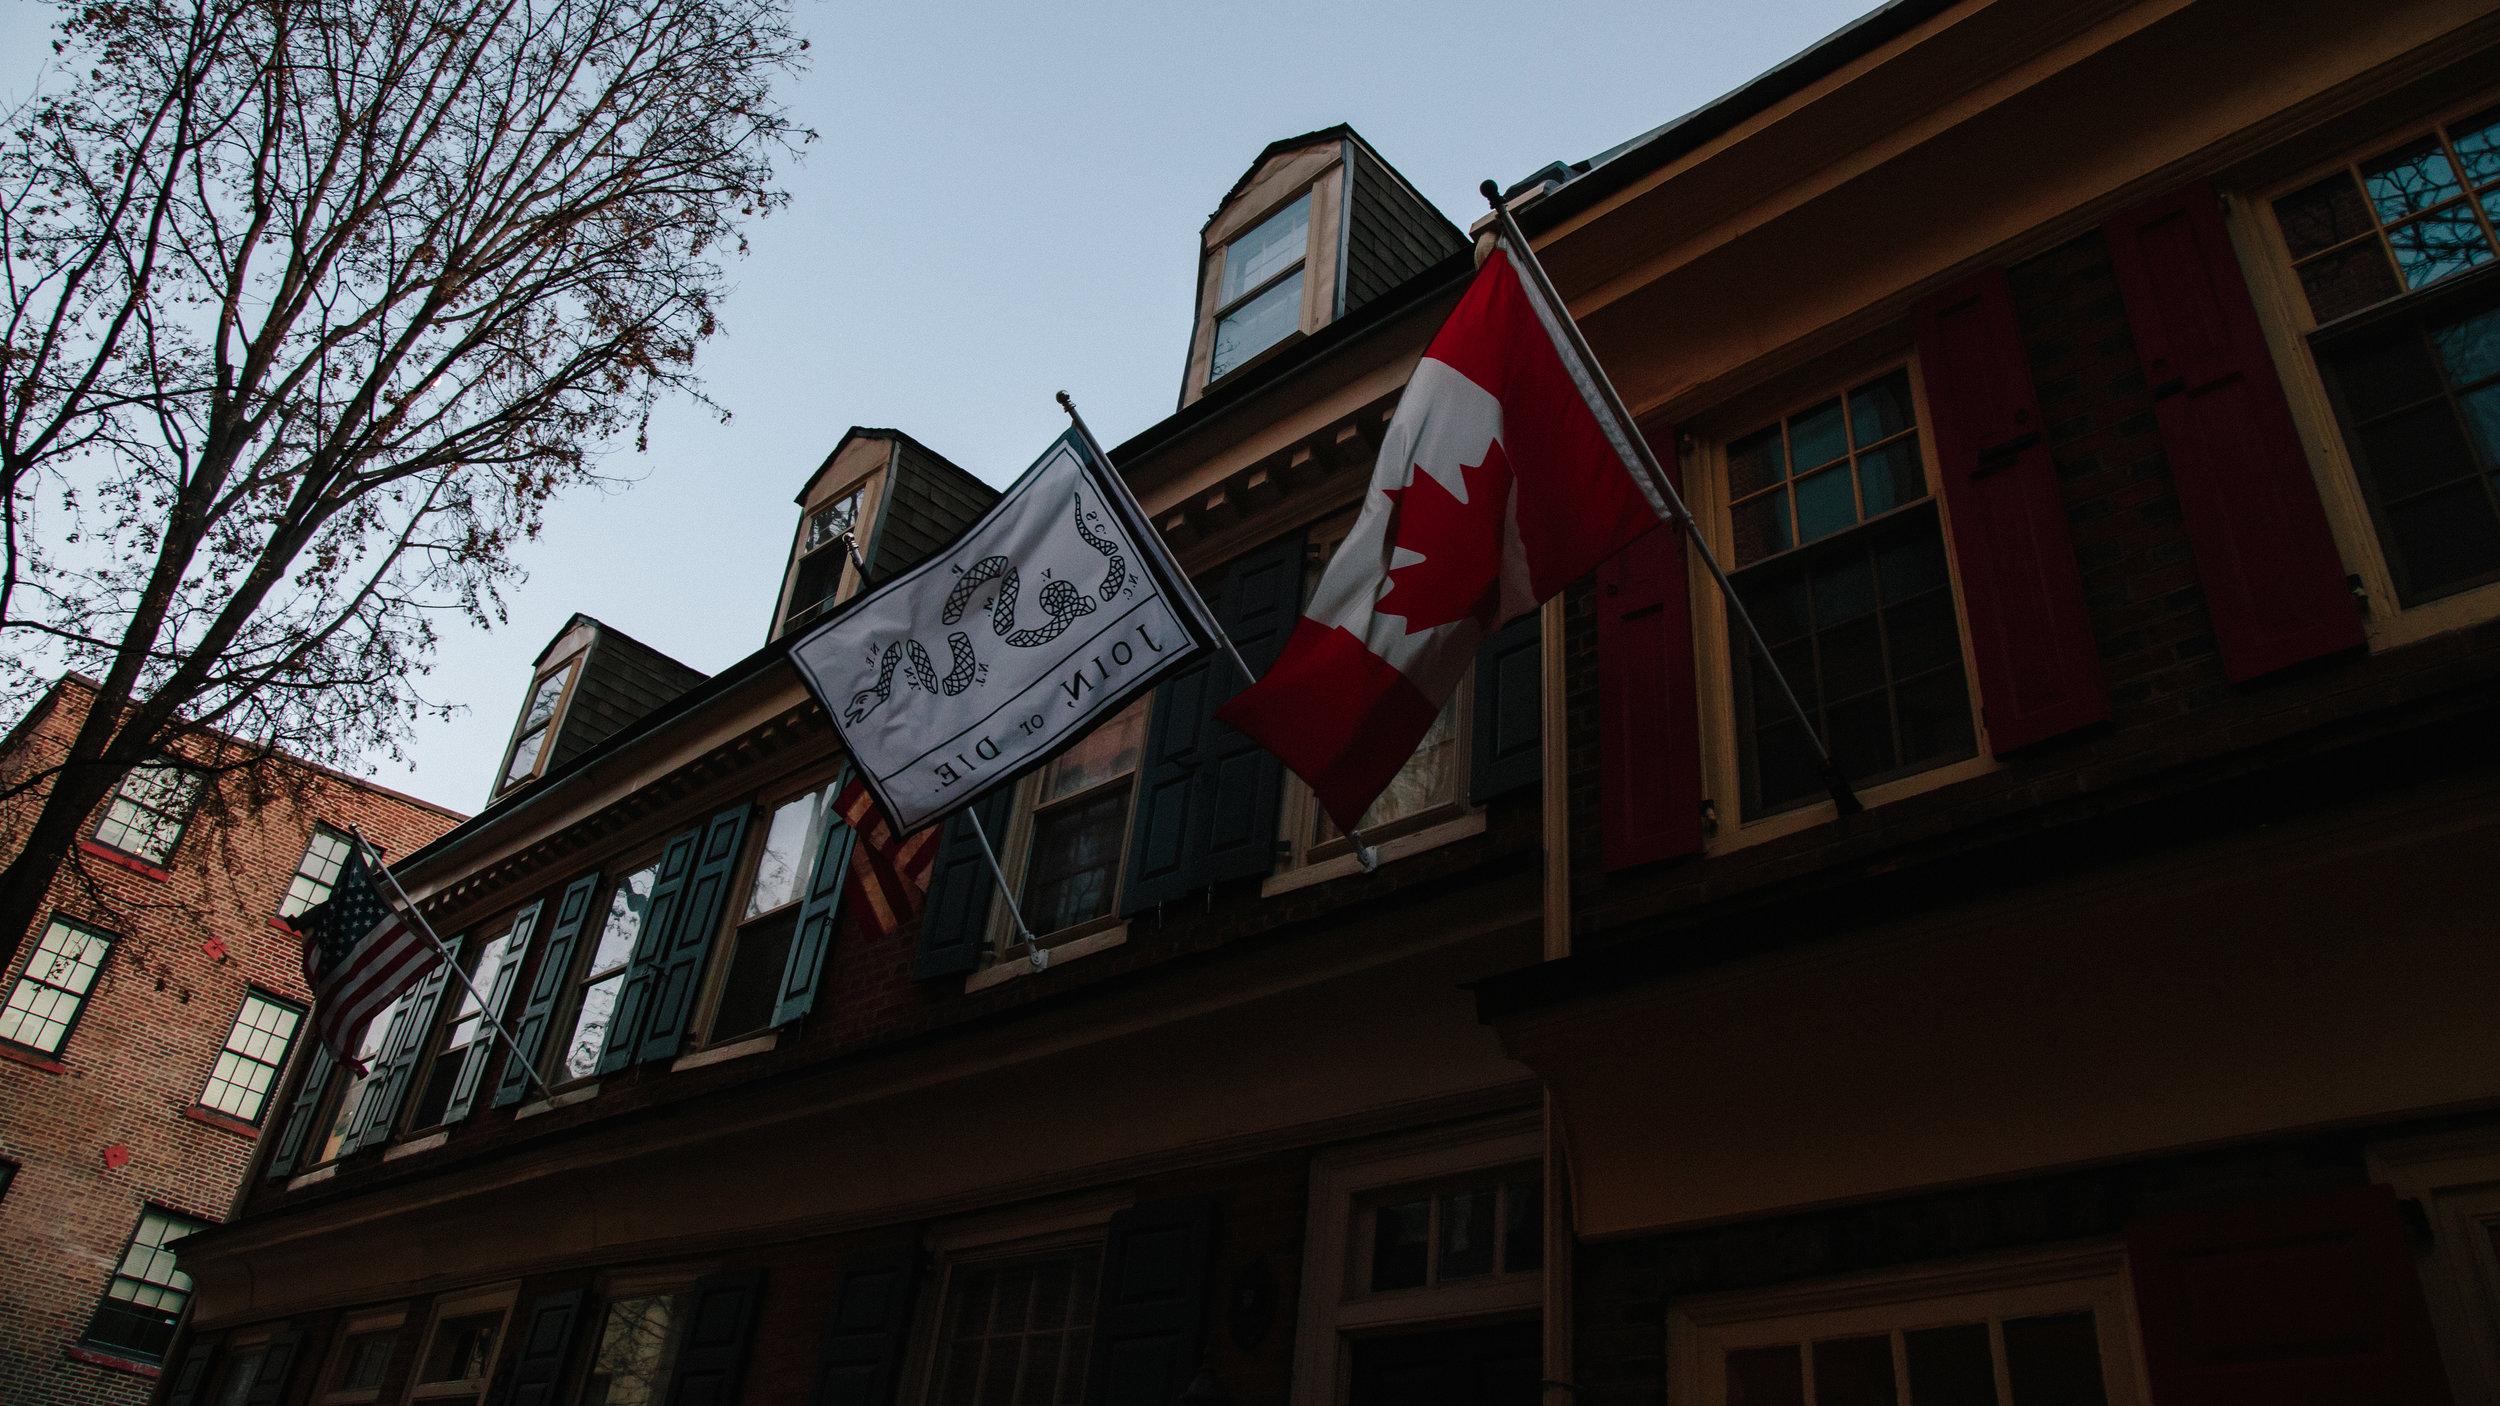 Flags on Building-71.jpg